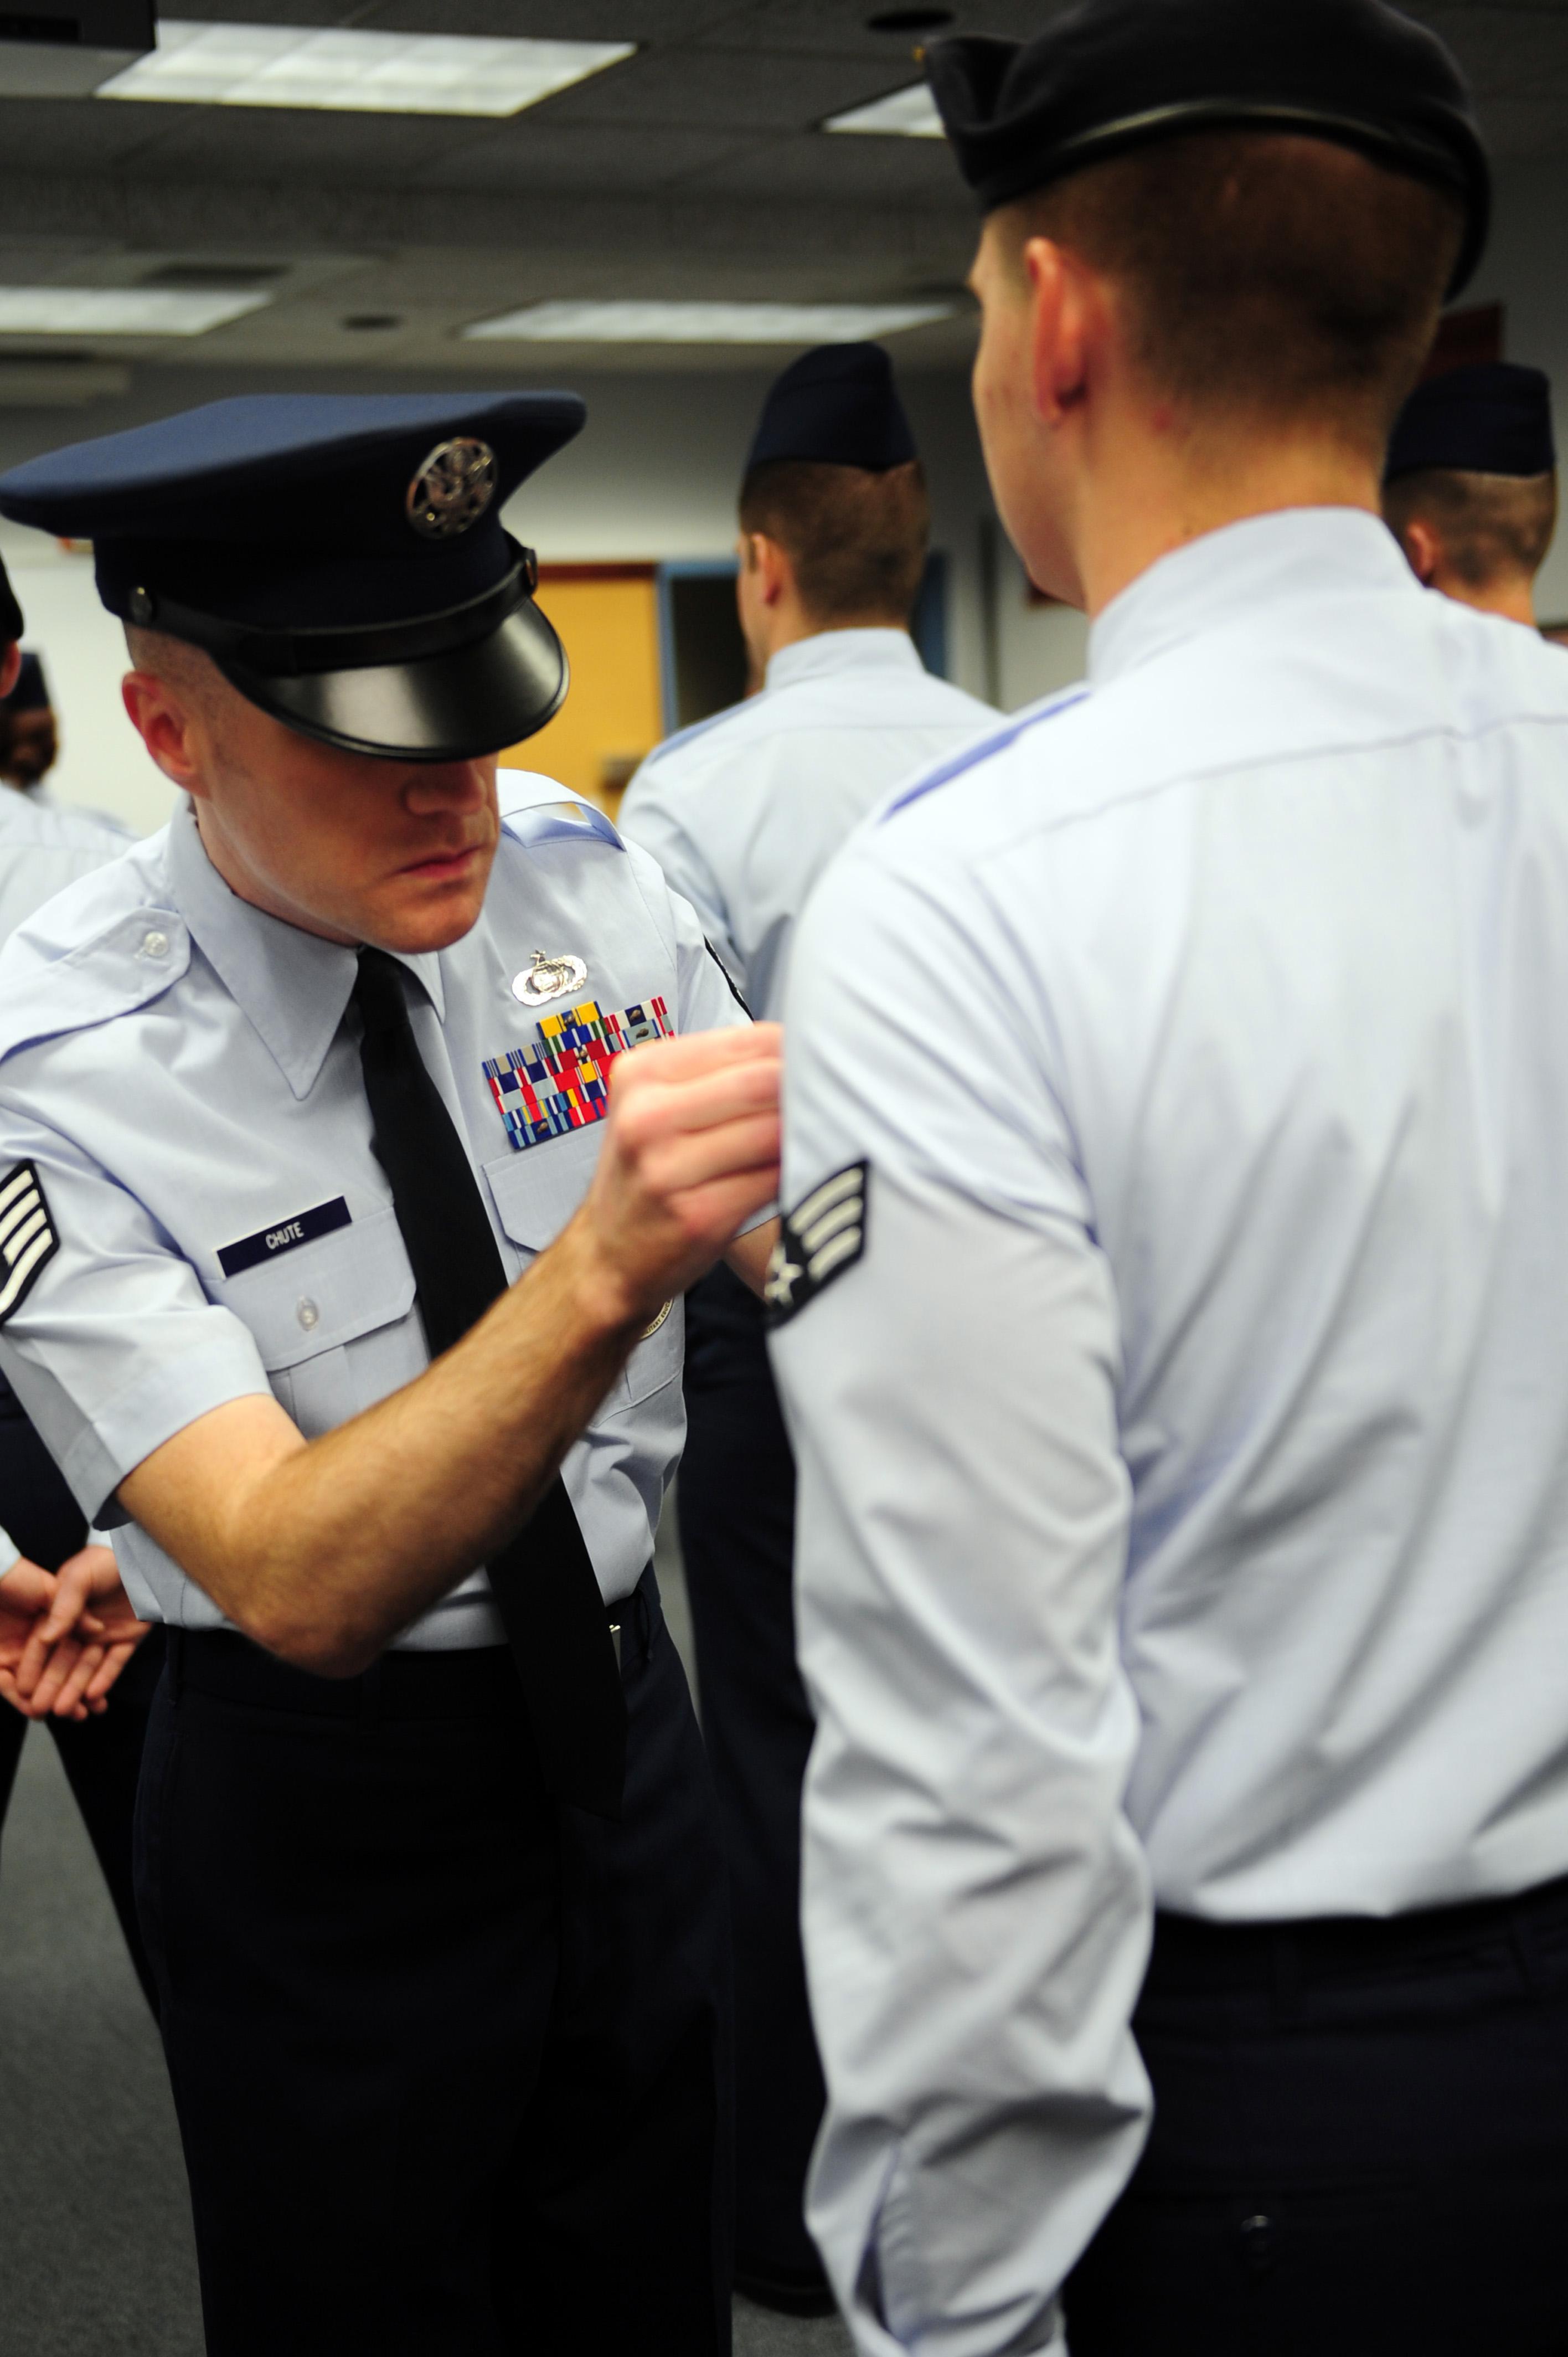 airman leadership school takes airmen to the next level